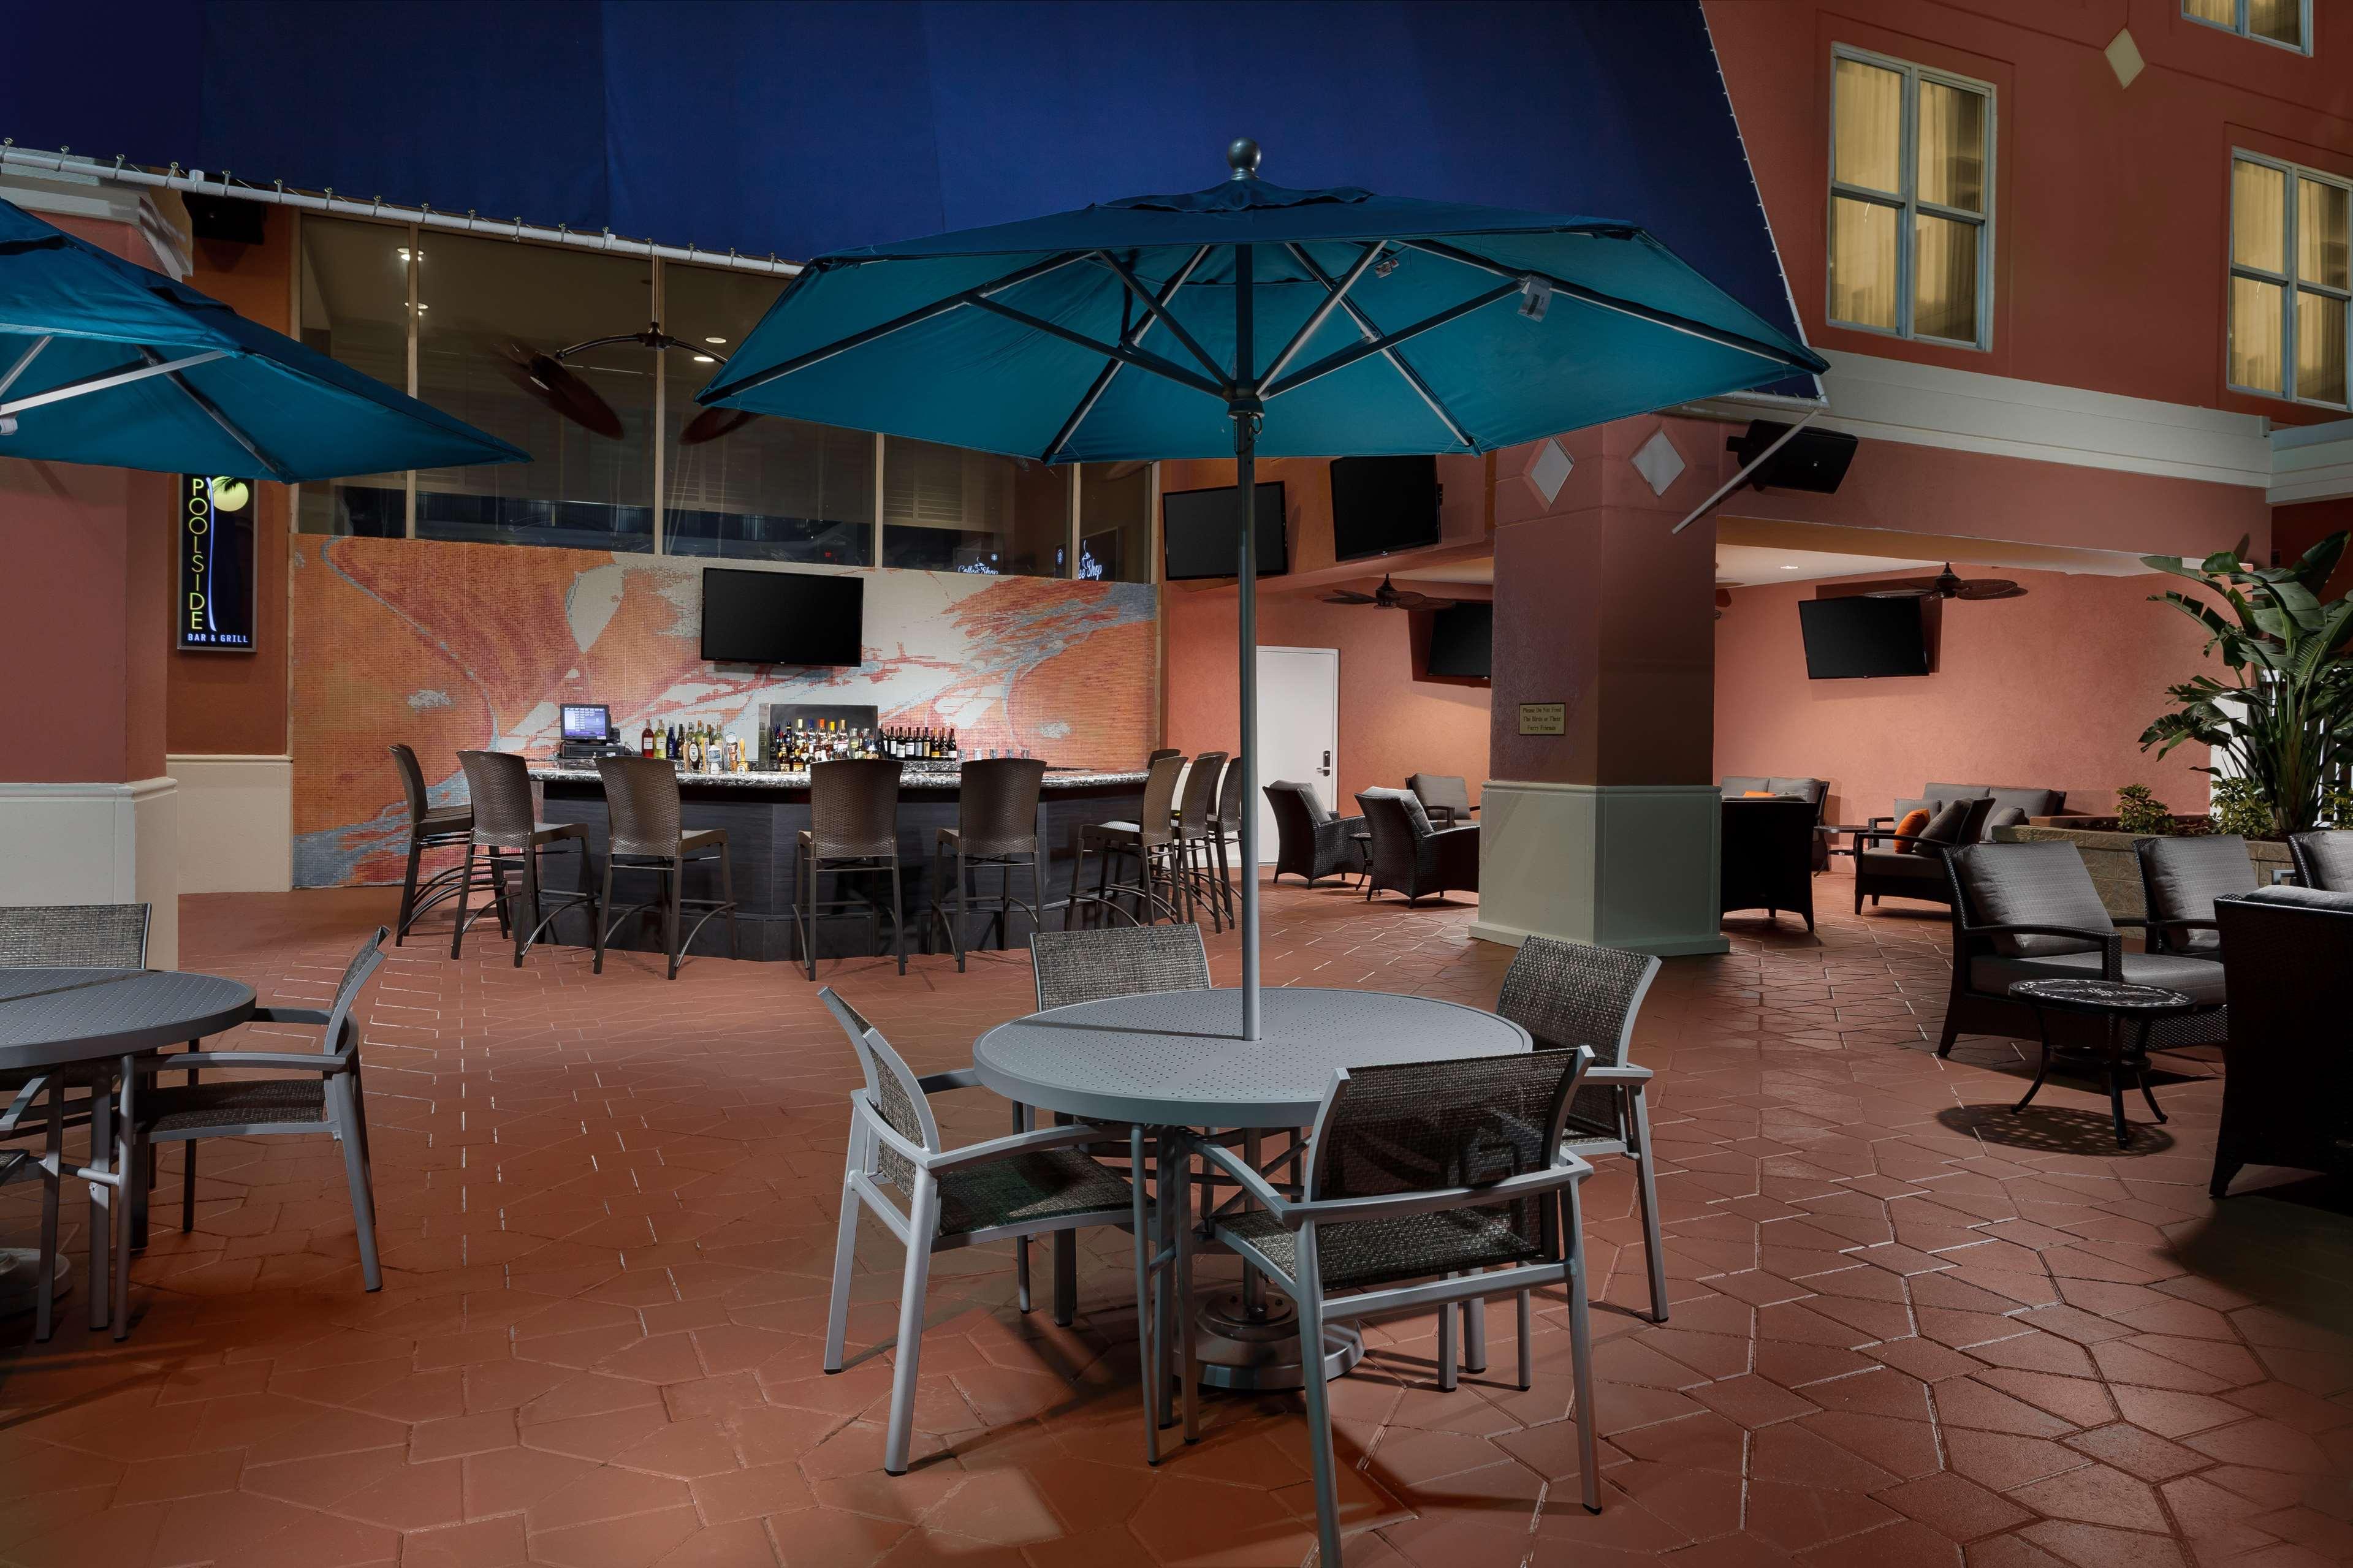 Embassy Suites by Hilton Orlando Lake Buena Vista Resort image 14